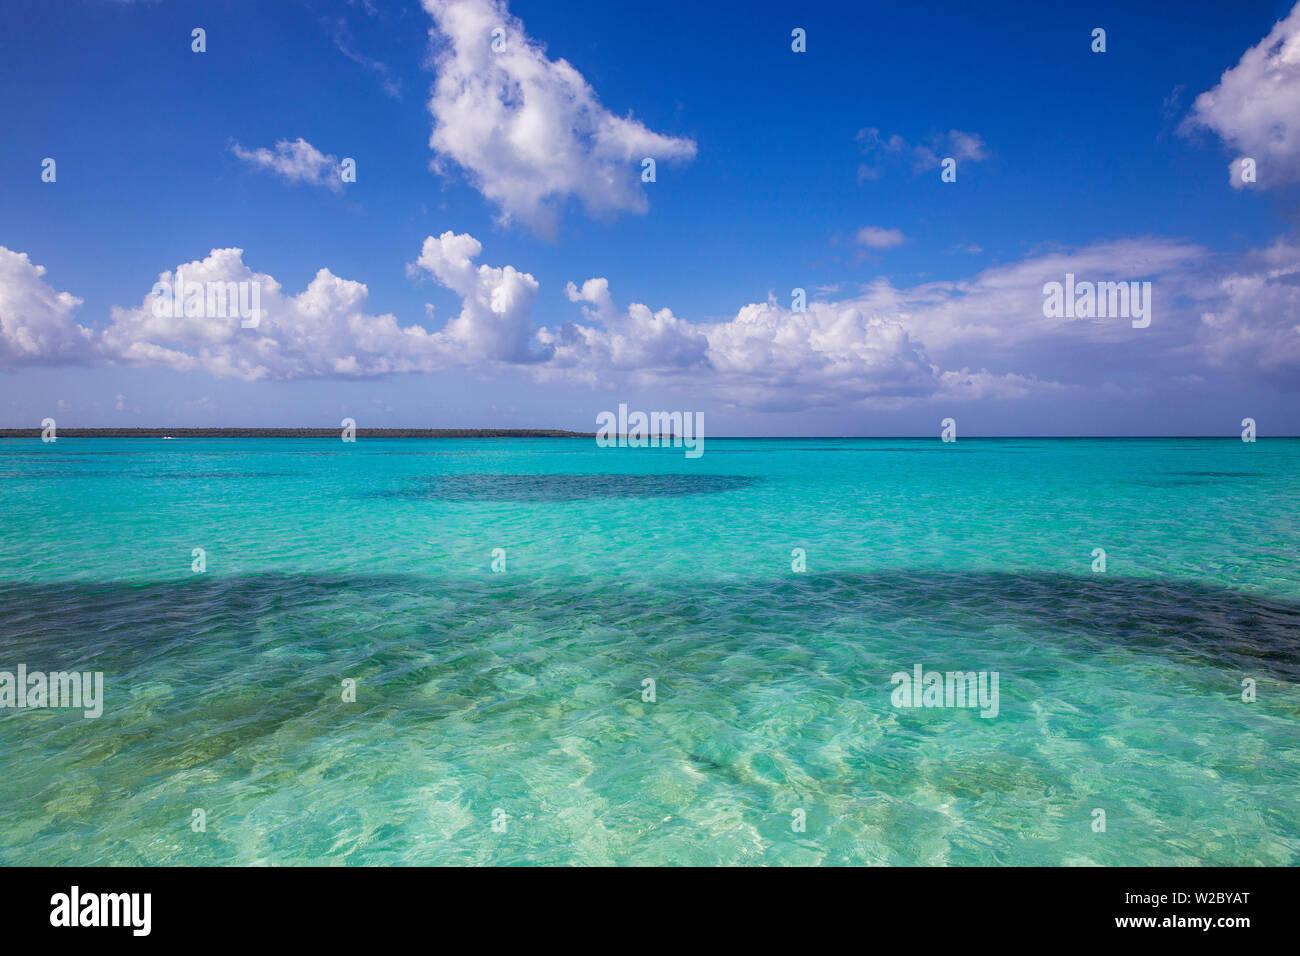 Dominikanische Republik, Punta Cana, Parque Nacional del Este, Piscina Natural, eine flache Sandbank Stockfoto